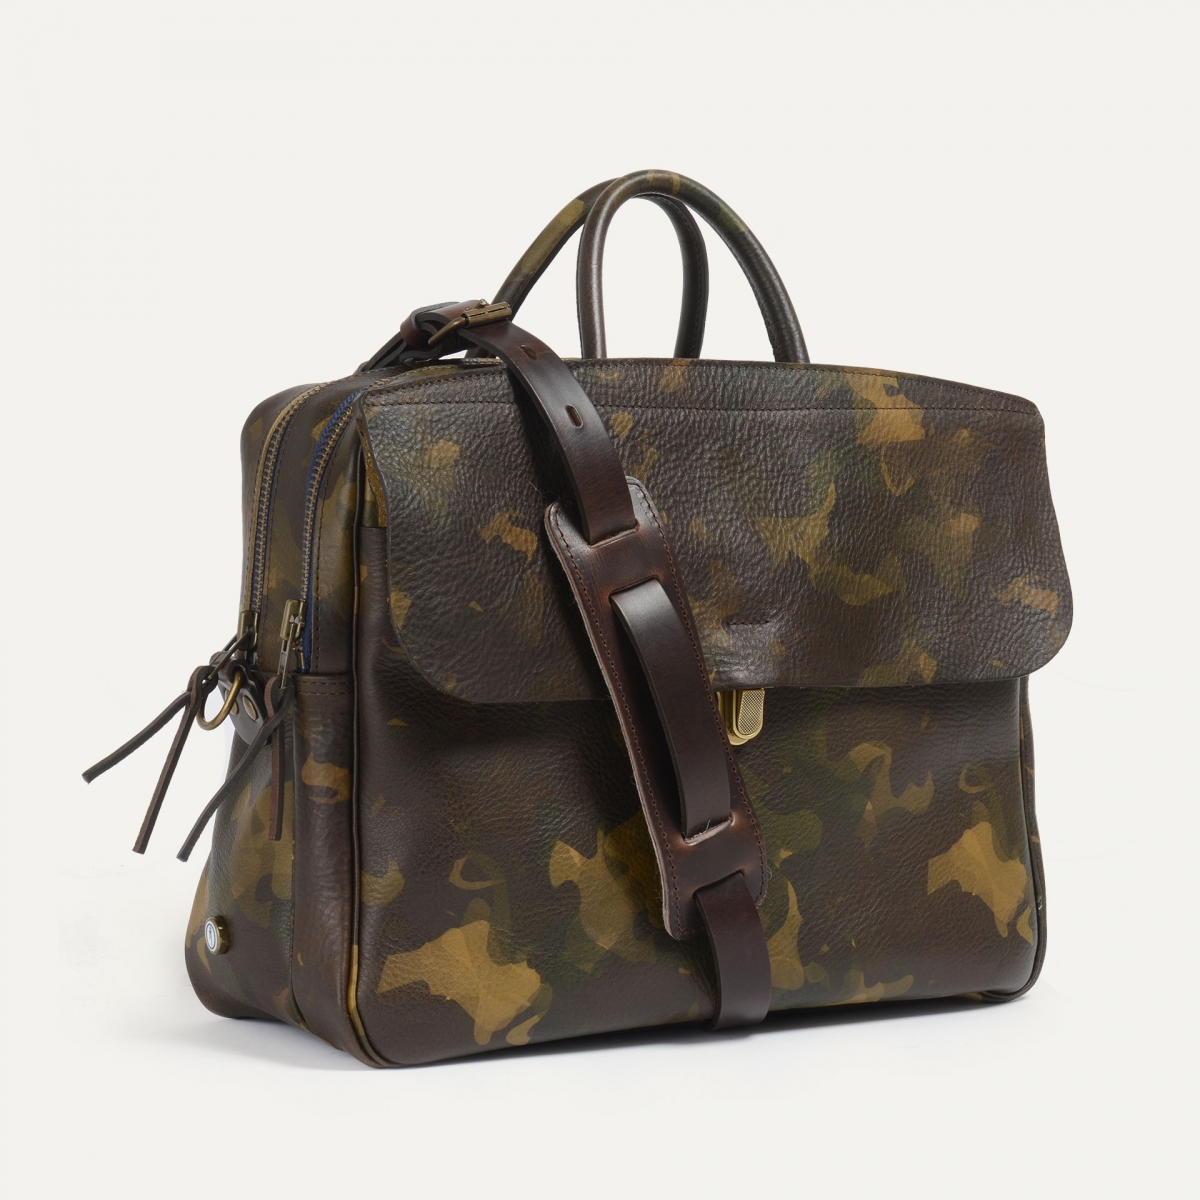 Zeppo Business bag - Camo (image n°2)